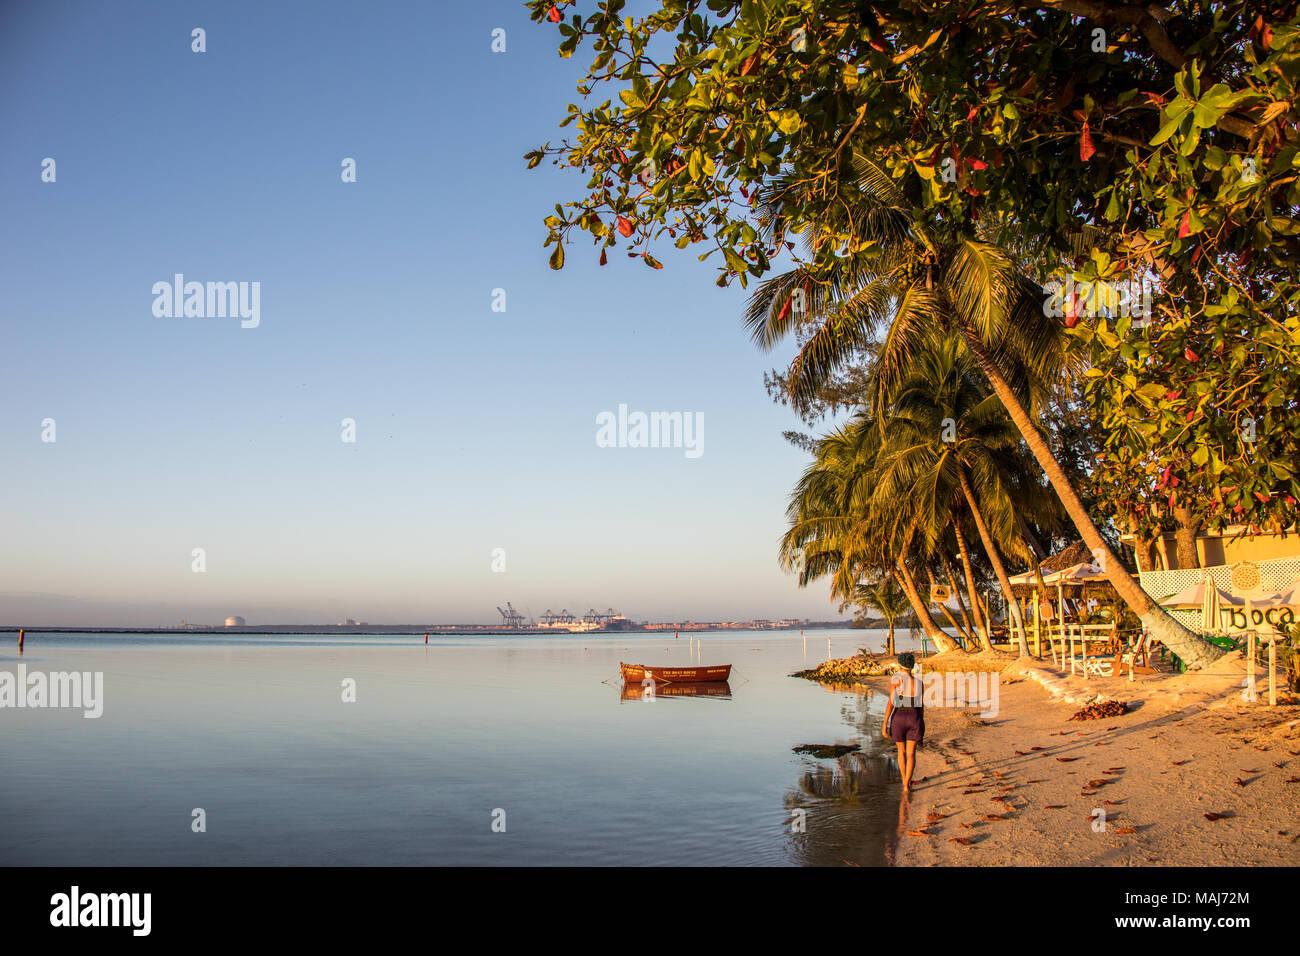 La Playa Pública de Boca Chica, Boca de China, República Domnican Imagen De Stock